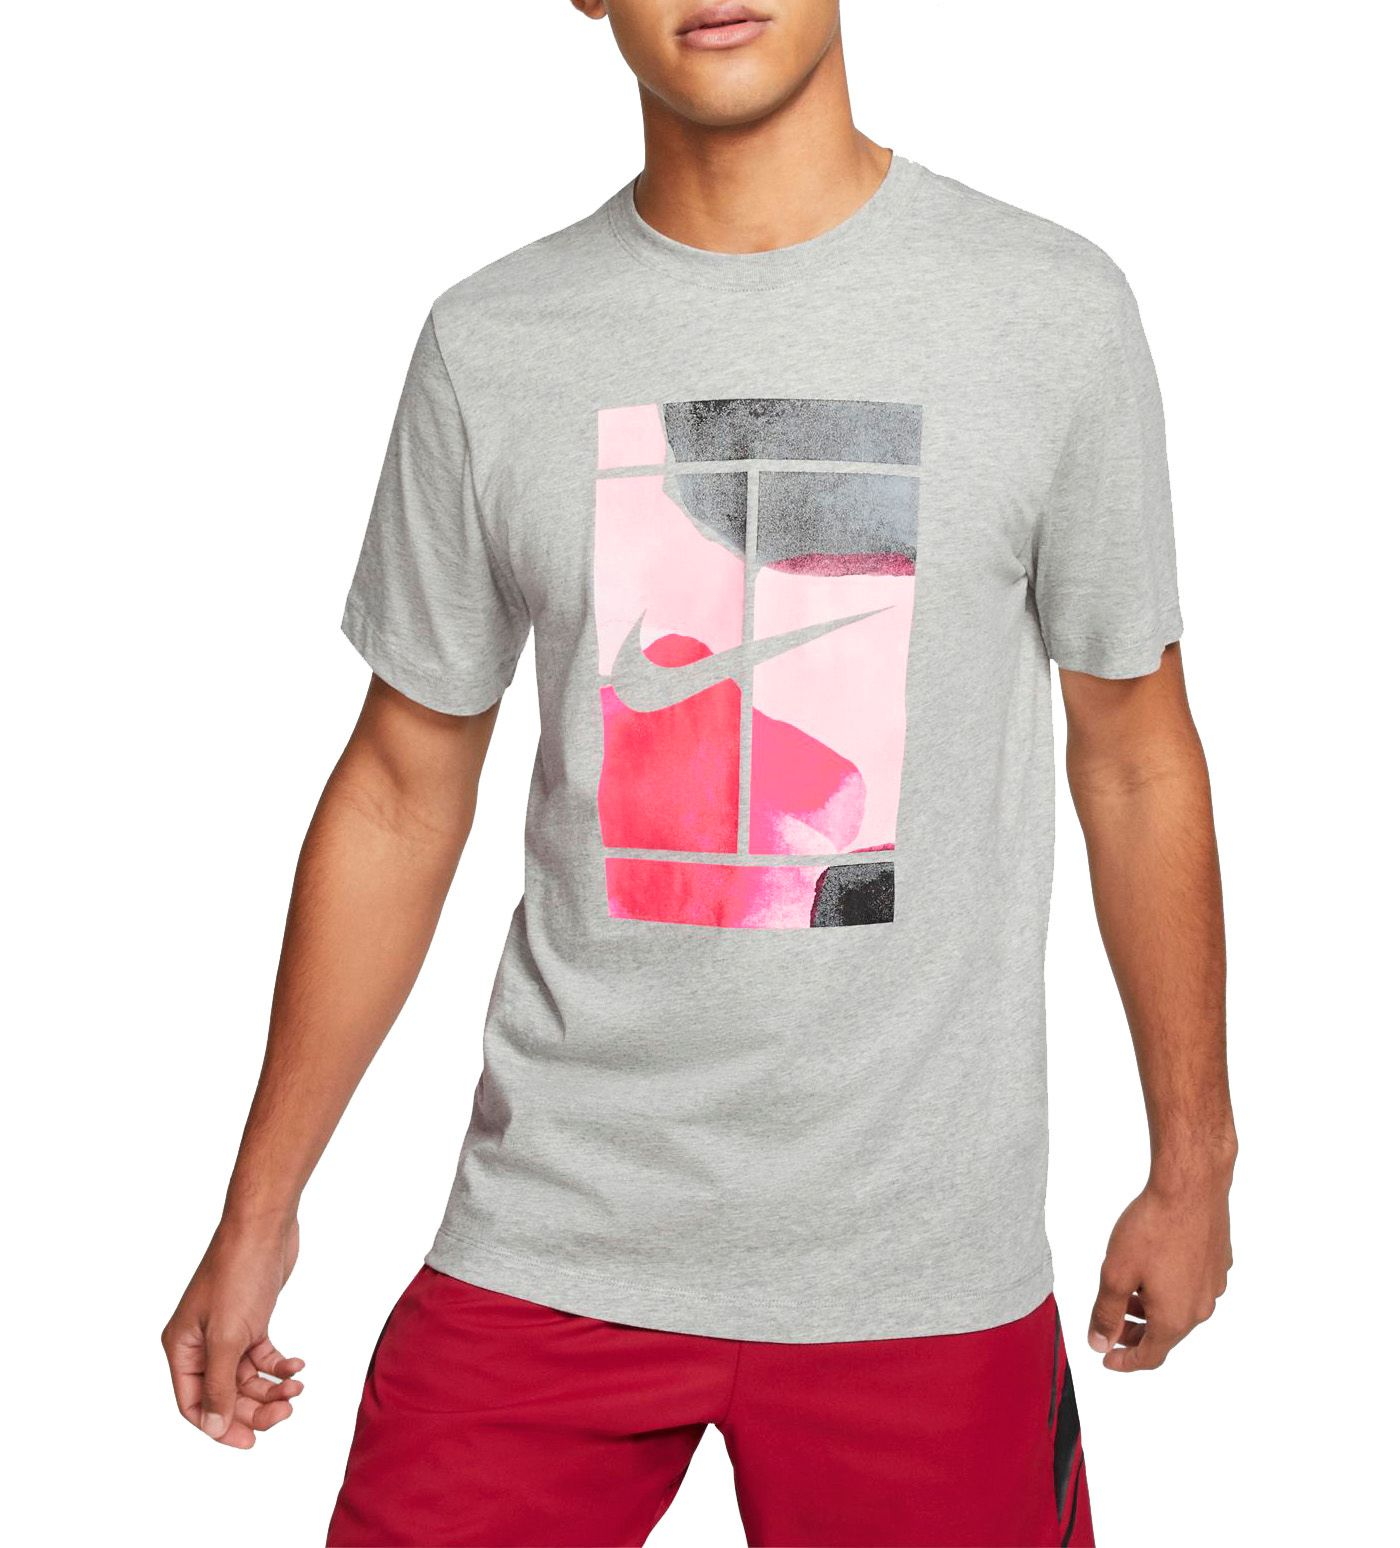 Nike Men's Tennis Court T-Shirt